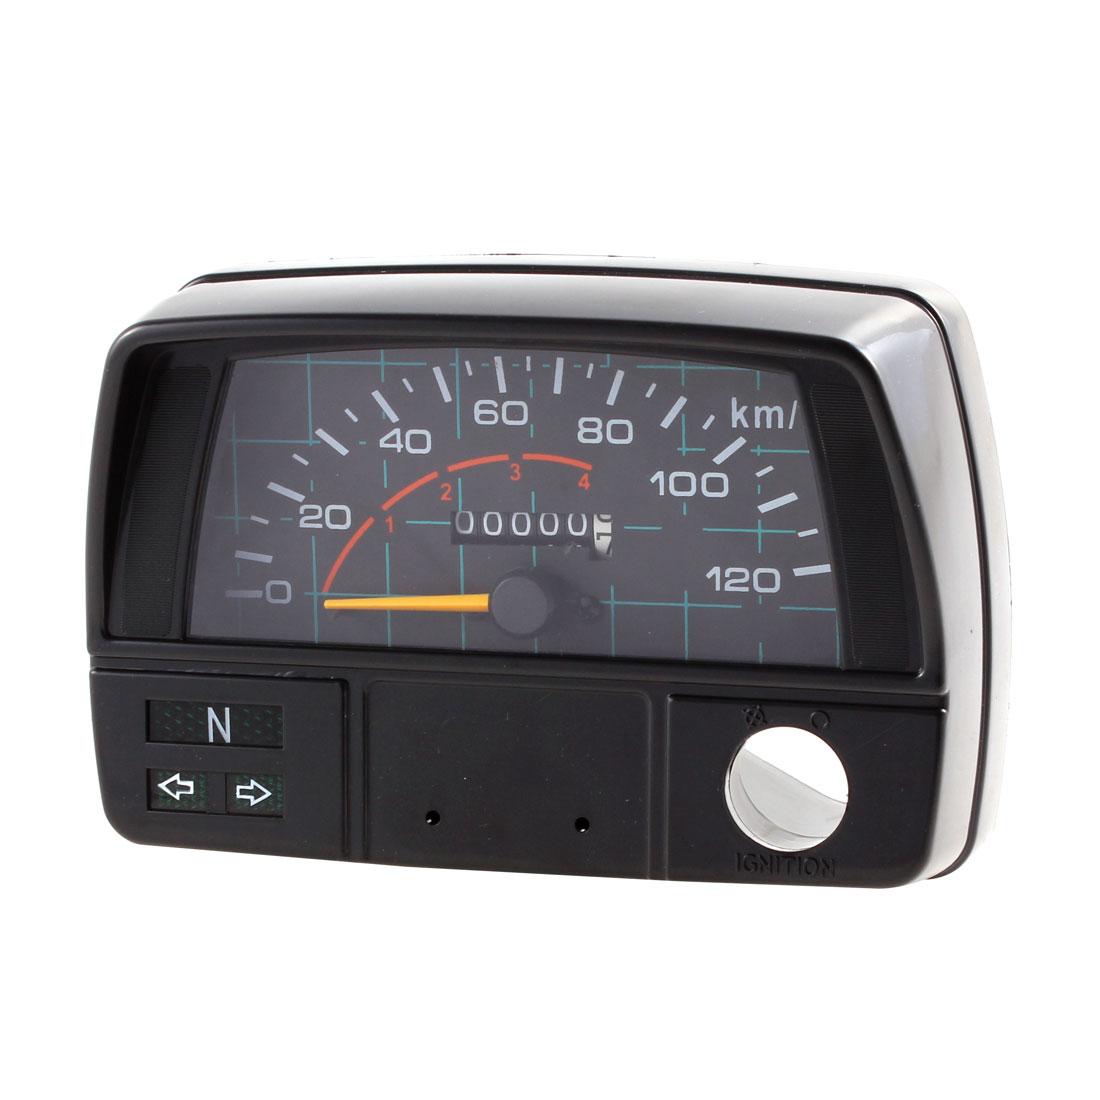 0-120km/h Motorcycle Analog Odometer Speedometer Meter Gauge DC 12V for JH-70